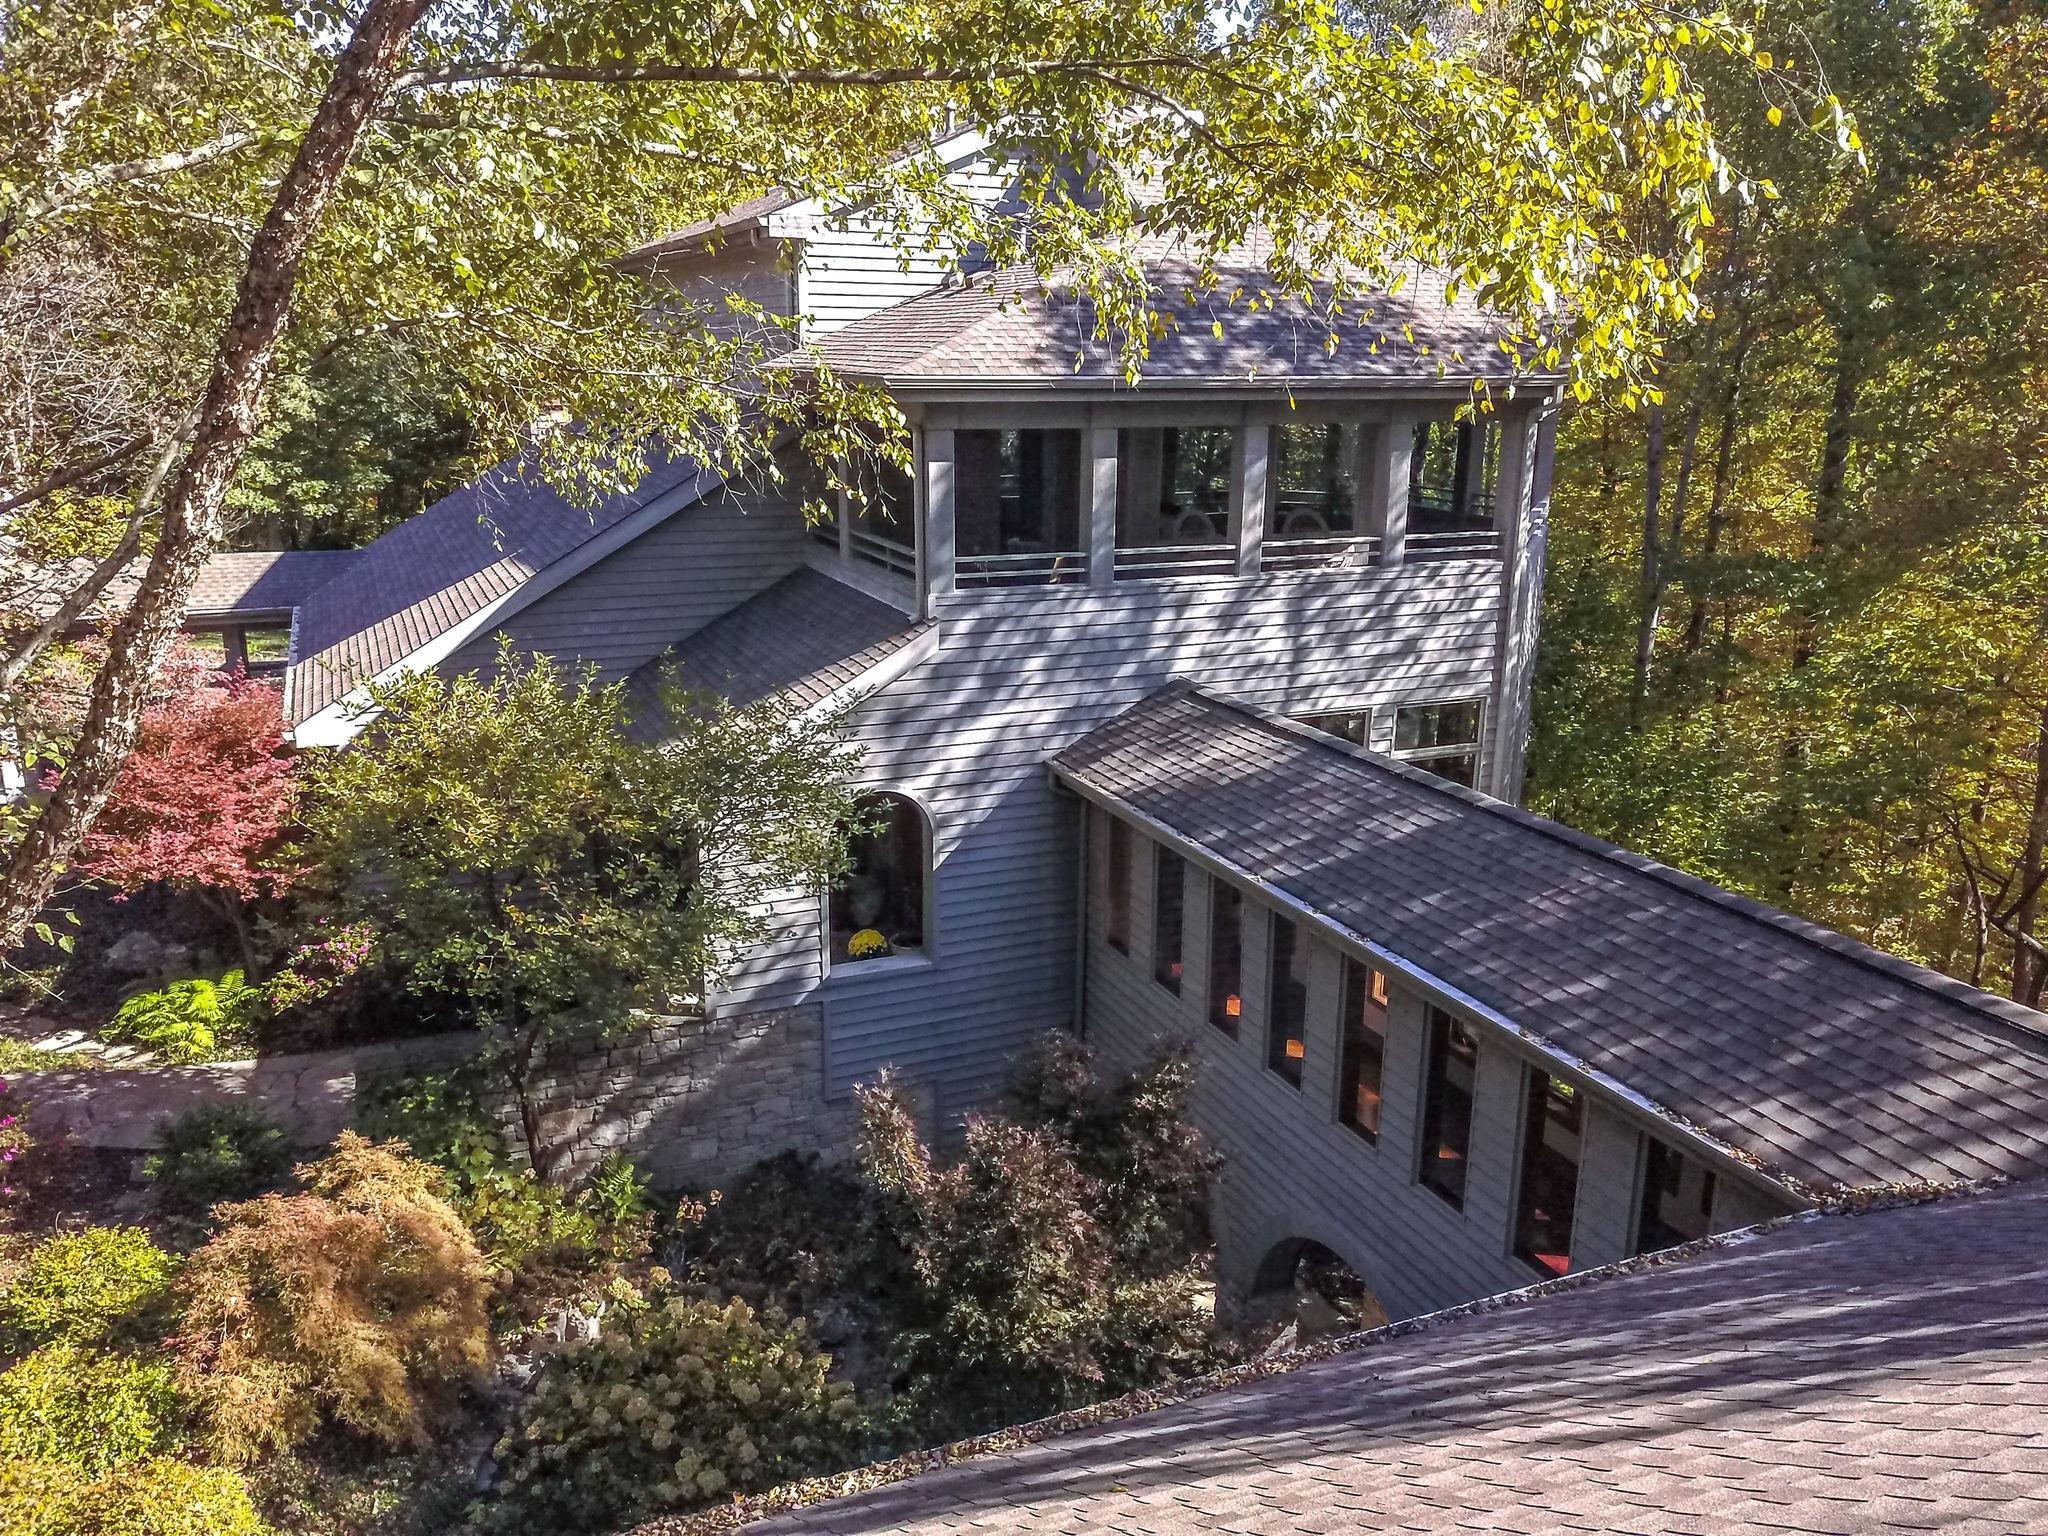 7600 Buffalo Rd, Nashville, TN 37221 - Nashville, TN real estate listing